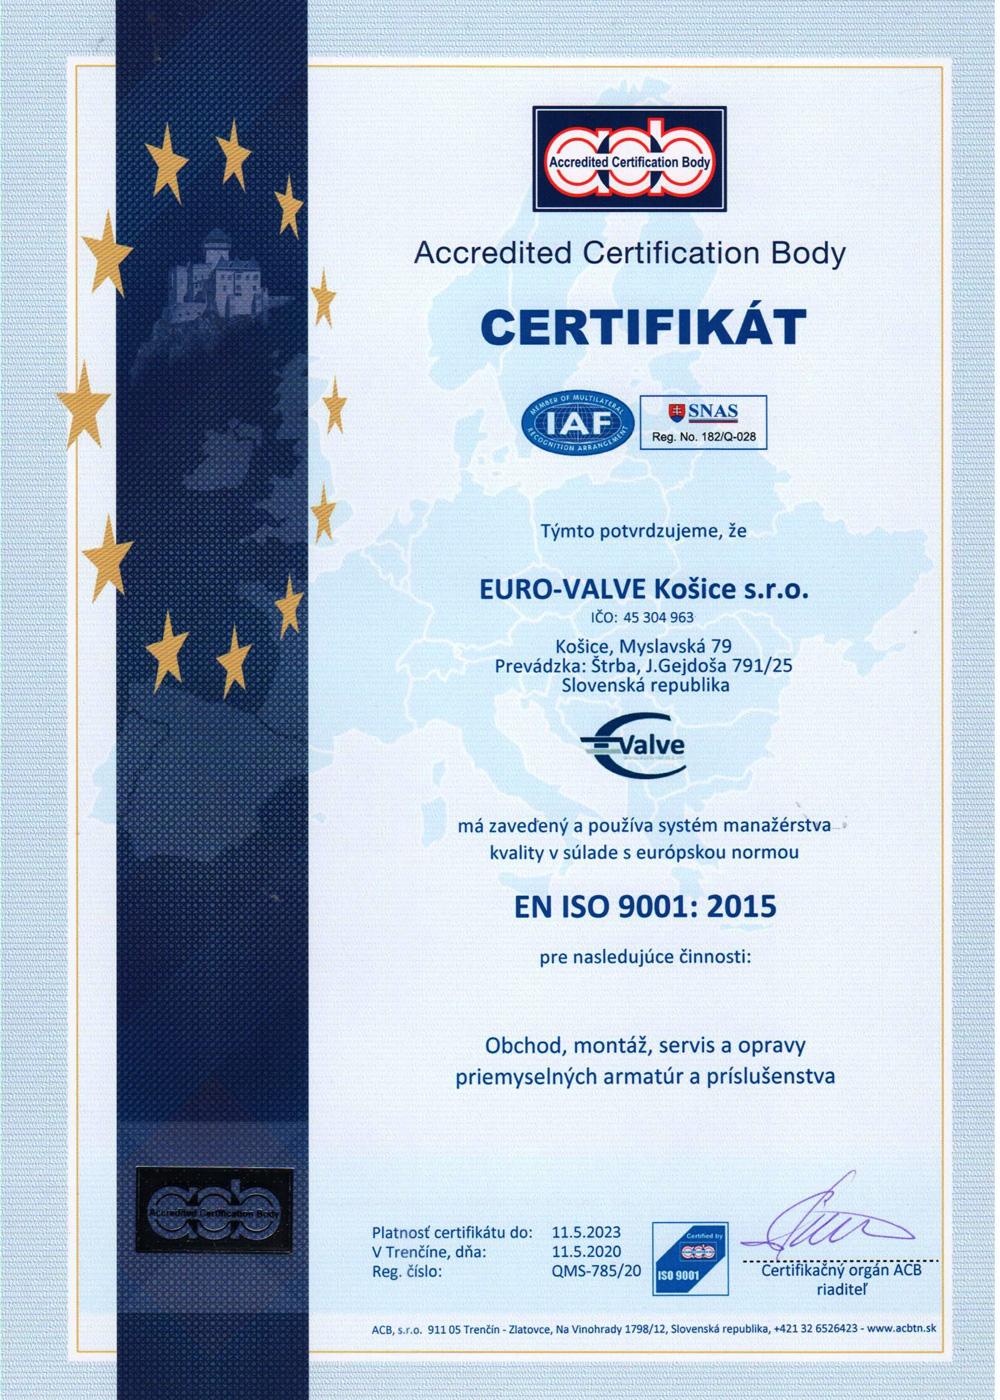 certifikát EURO-VALVE Košice s.r.o.